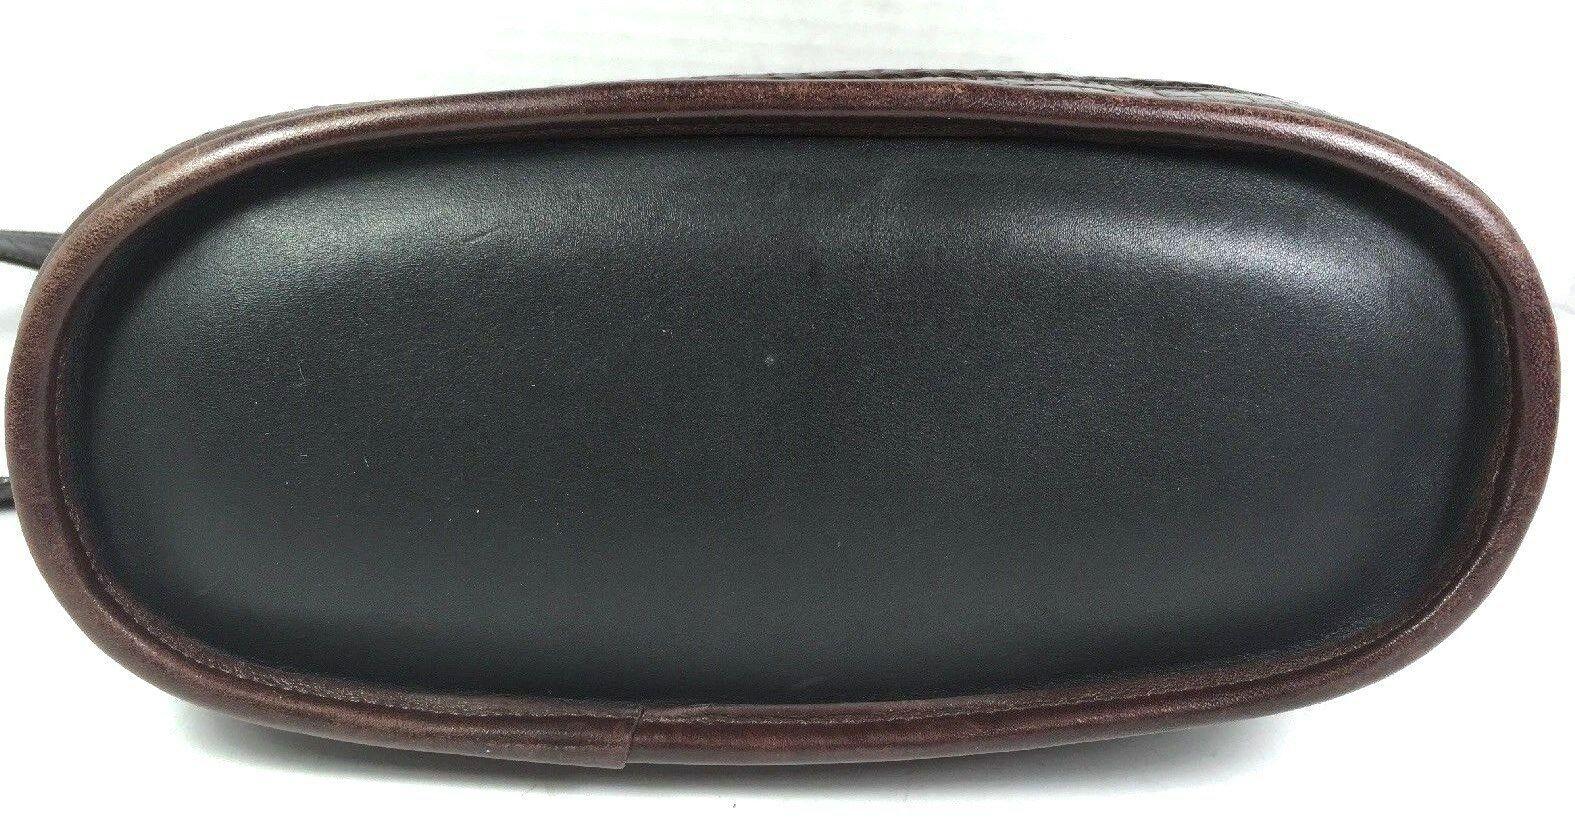 Vintage Black Leather with Brown Reptile Print Trim Bucket Shoulder Bag